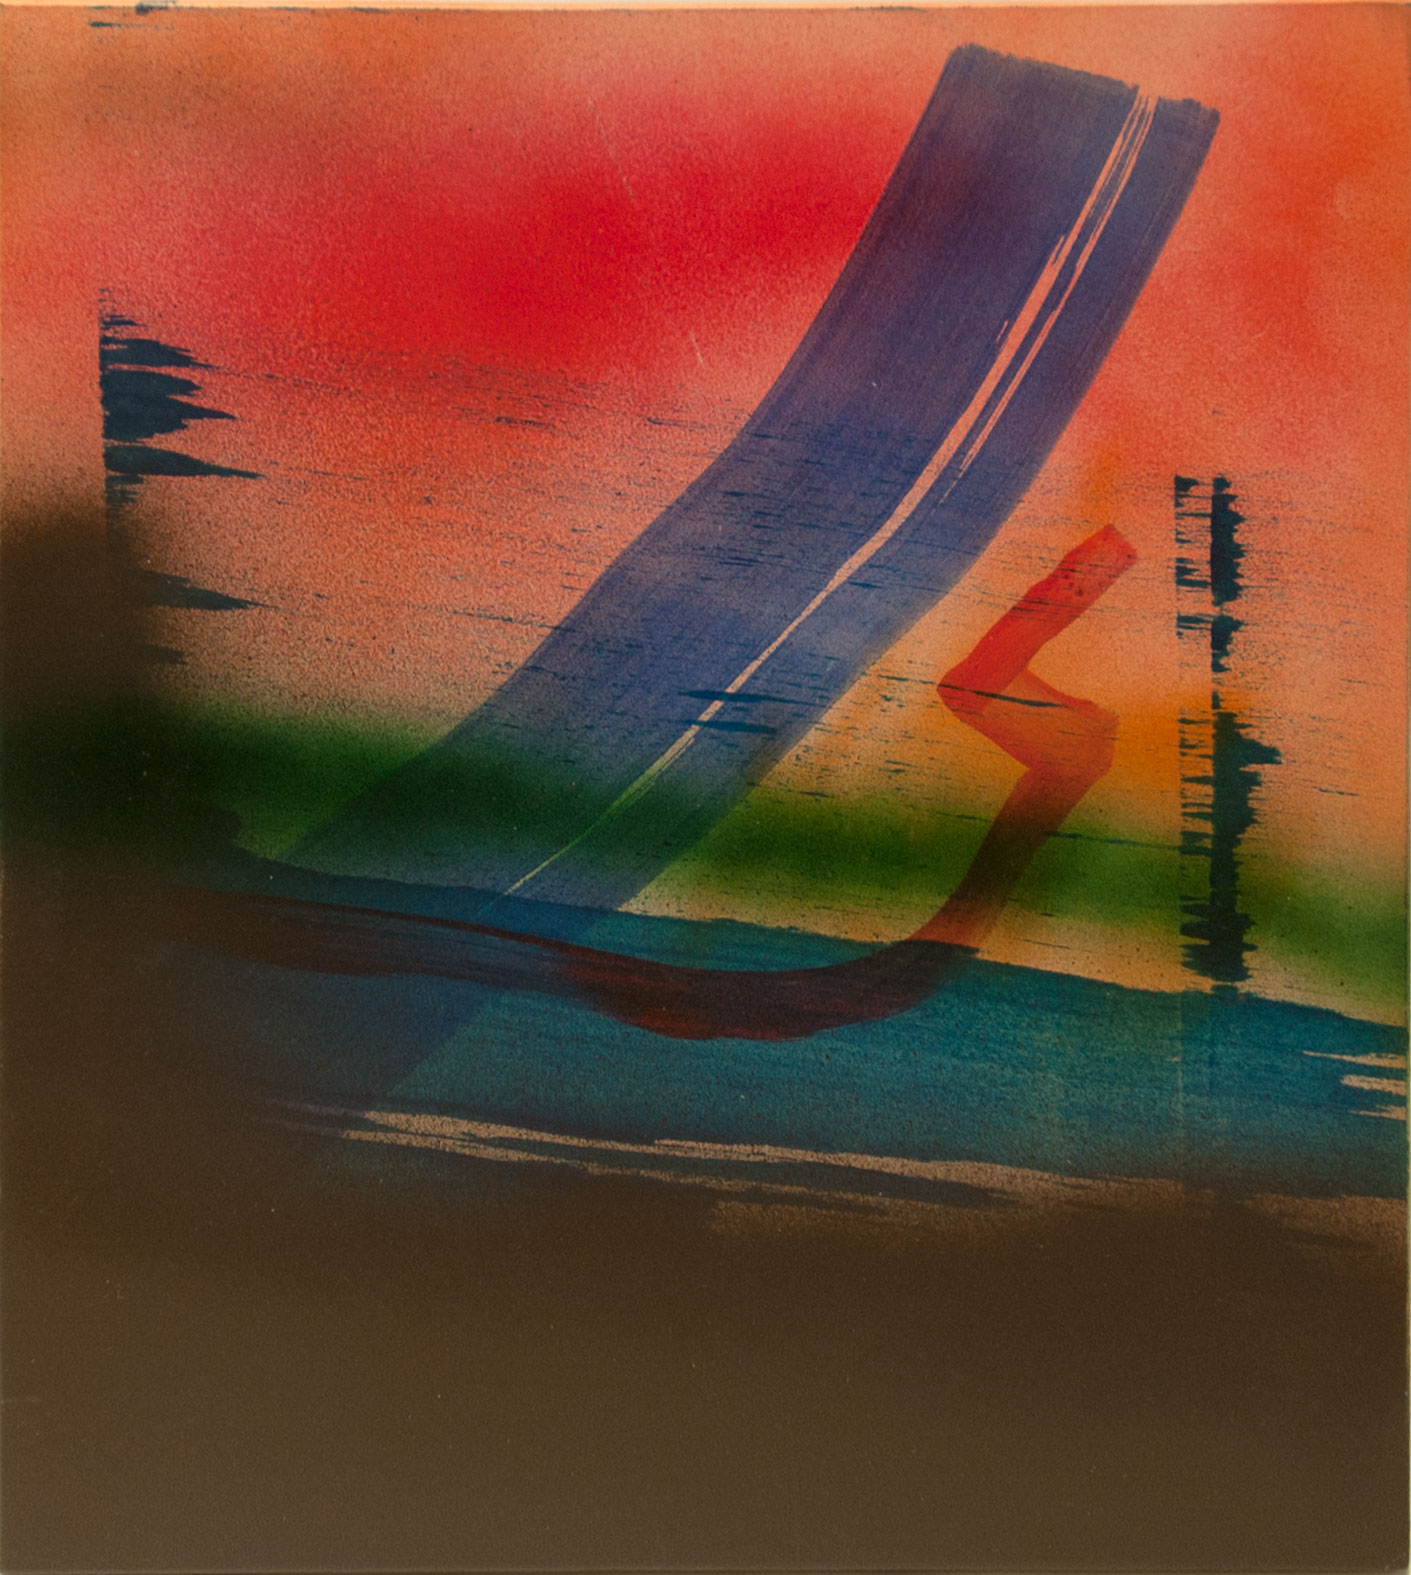 Untitled 4, 2015, acrylic on panel, 14.25 x 12